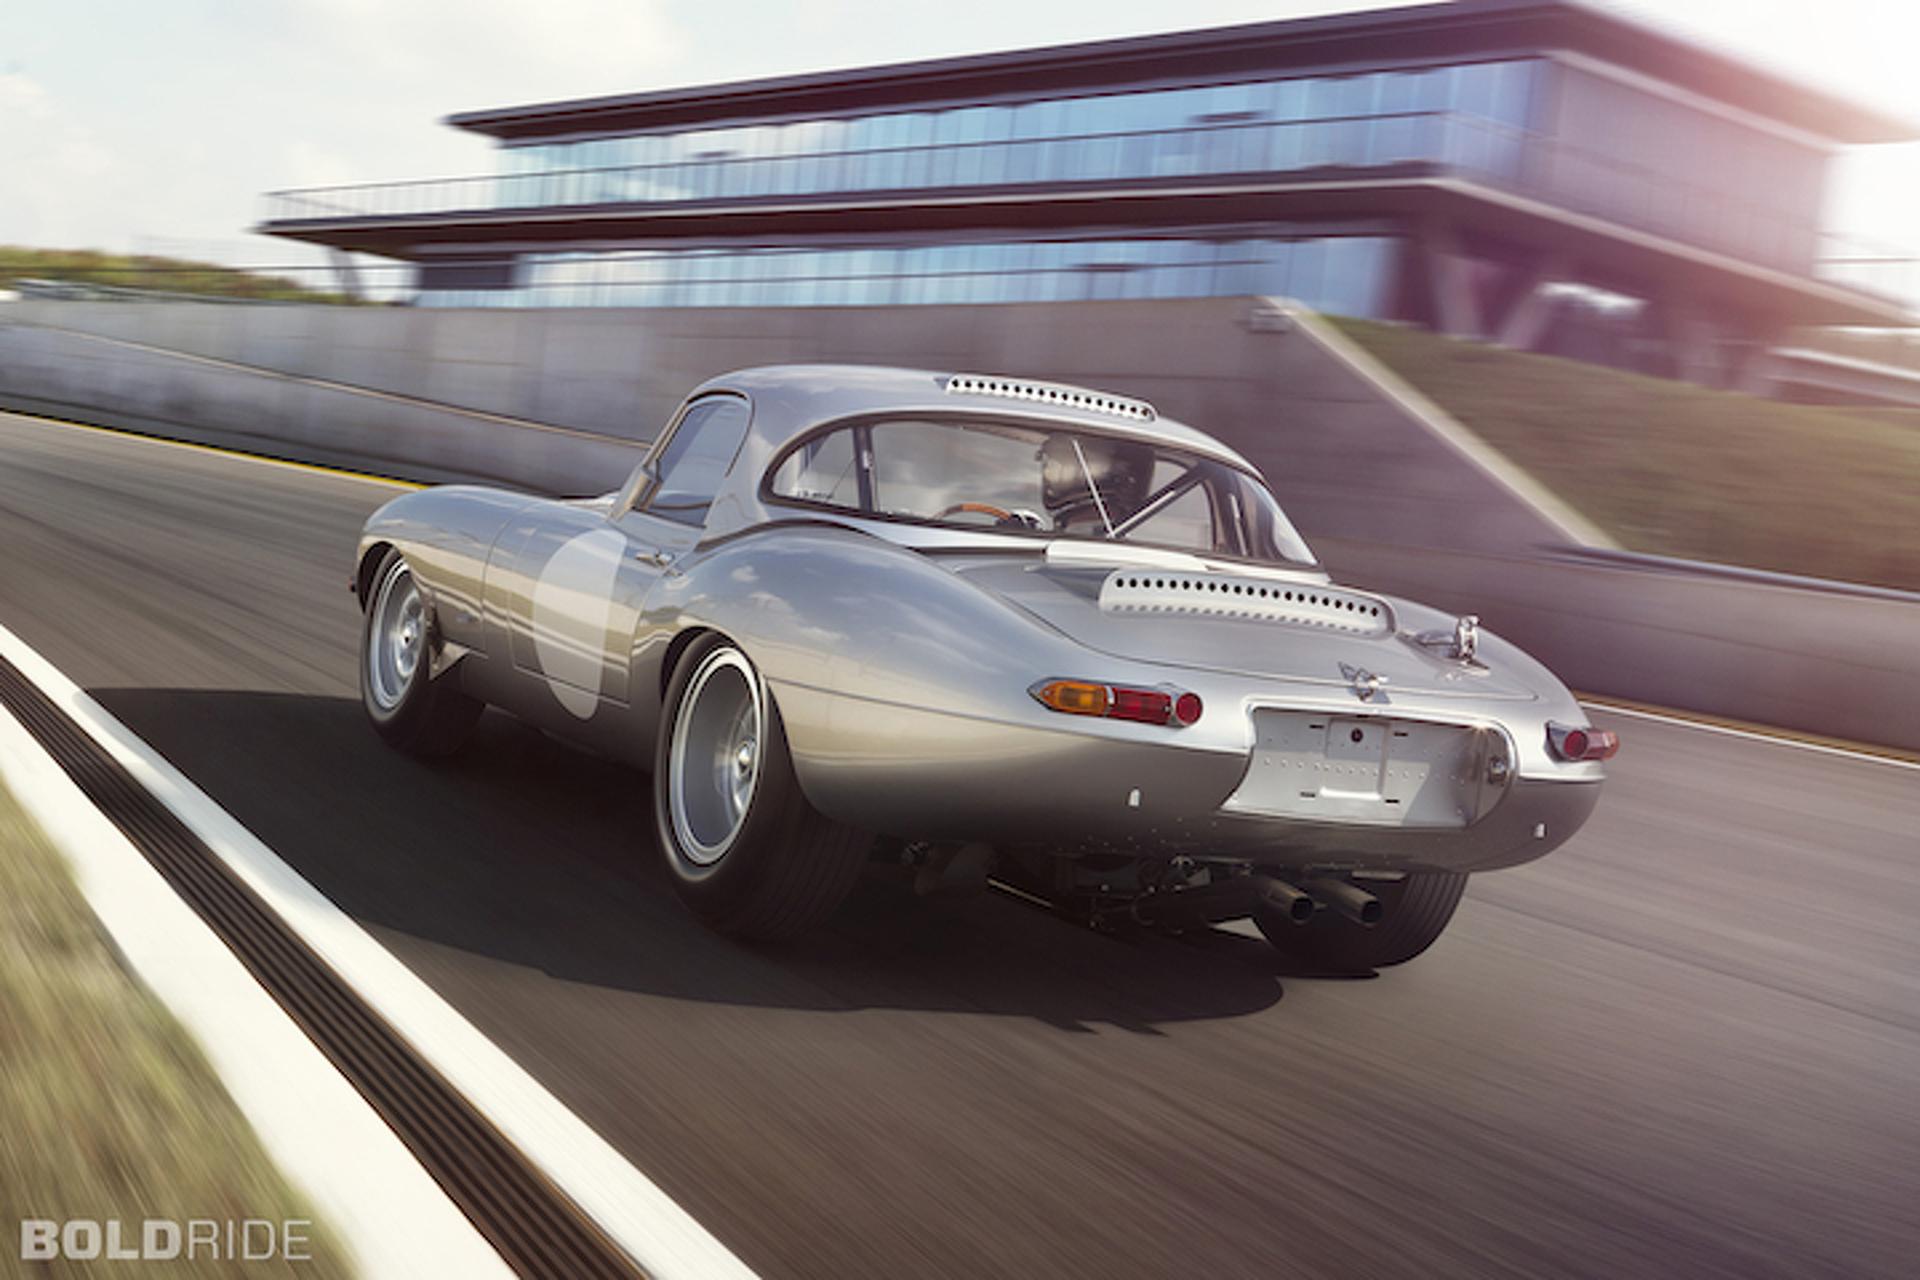 Jaguar E-Type Lightweight is a Stunning Homage Built for Racing [w/Video]